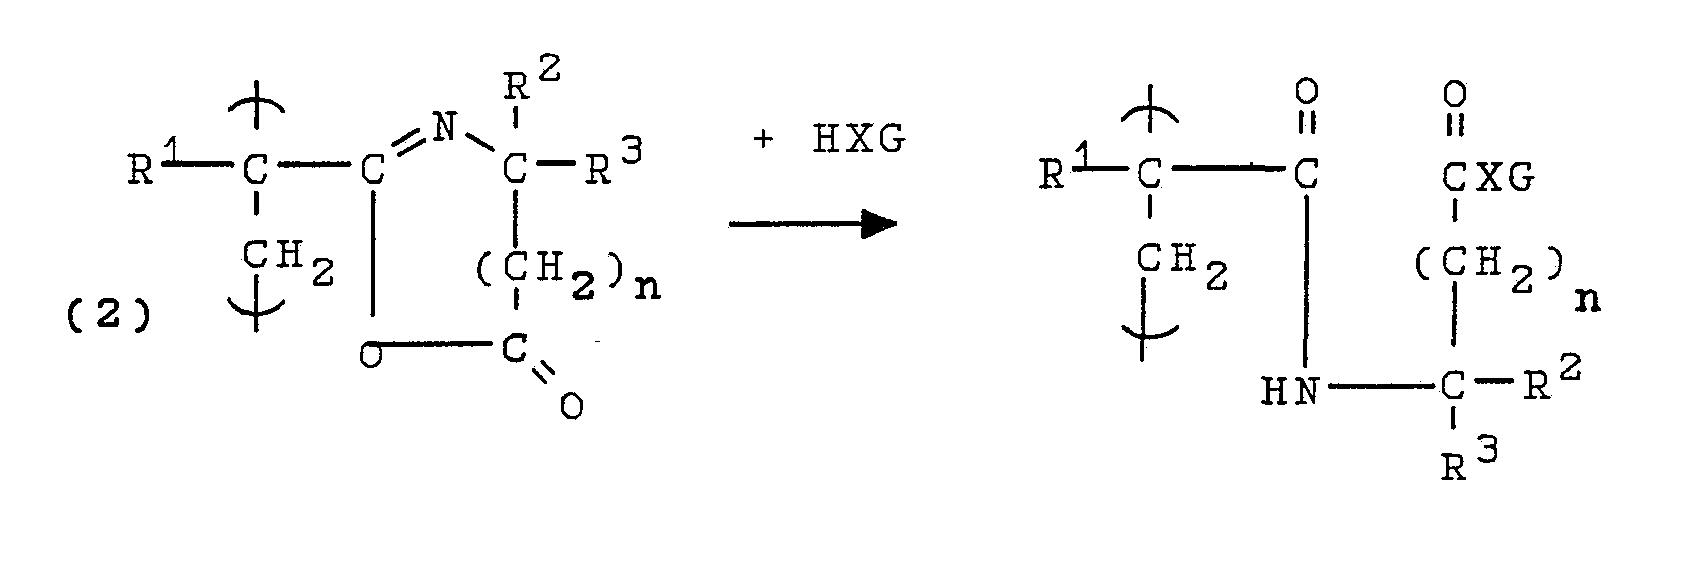 an experiment for constructing 2 methylphenoxyacetic acid a complex biologically active compound Муса джалиль (ученики 7 класса, амирова а р) презентации ppt 2 644 кб 36 код для.